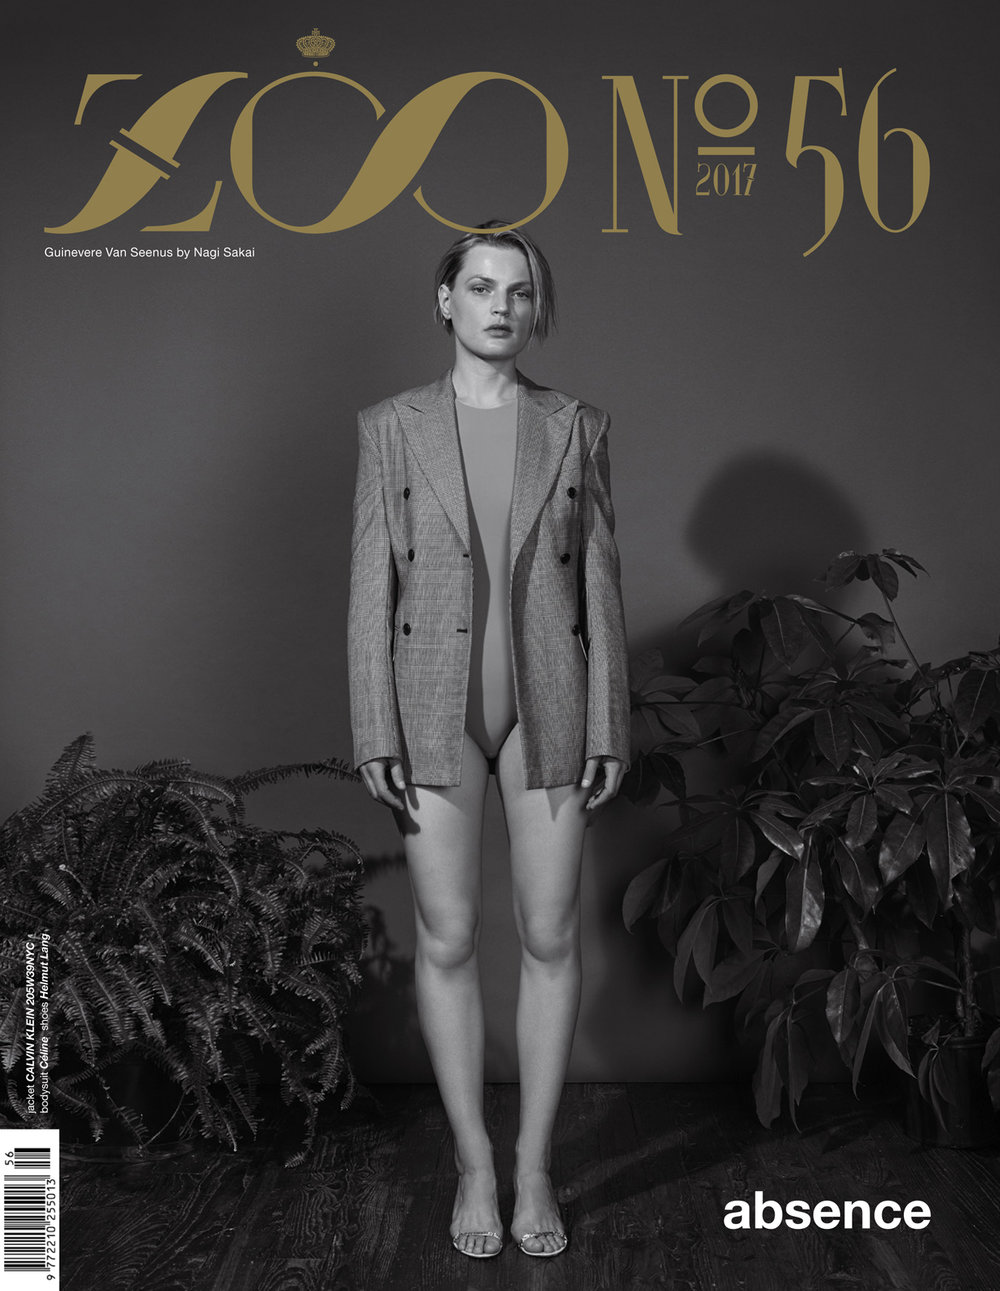 ZOO Magazine No 56 cover story by Nagi Sakai